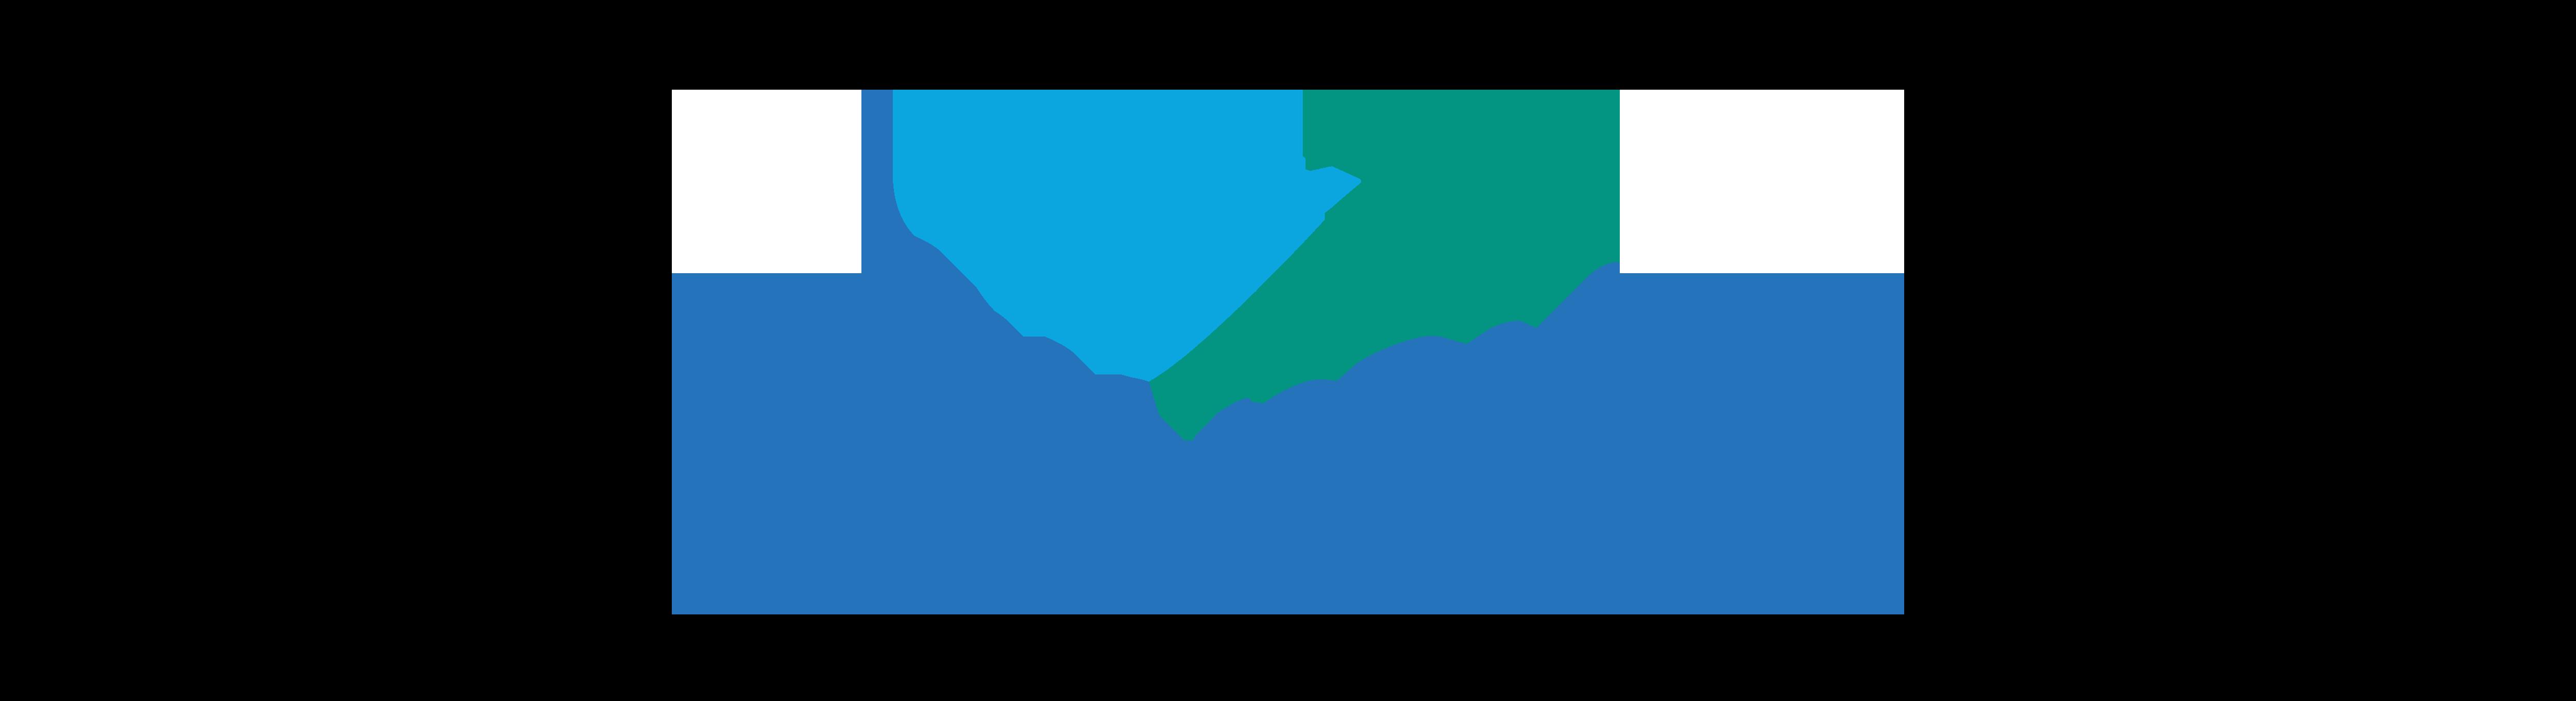 CEBU PACIFIC Logo